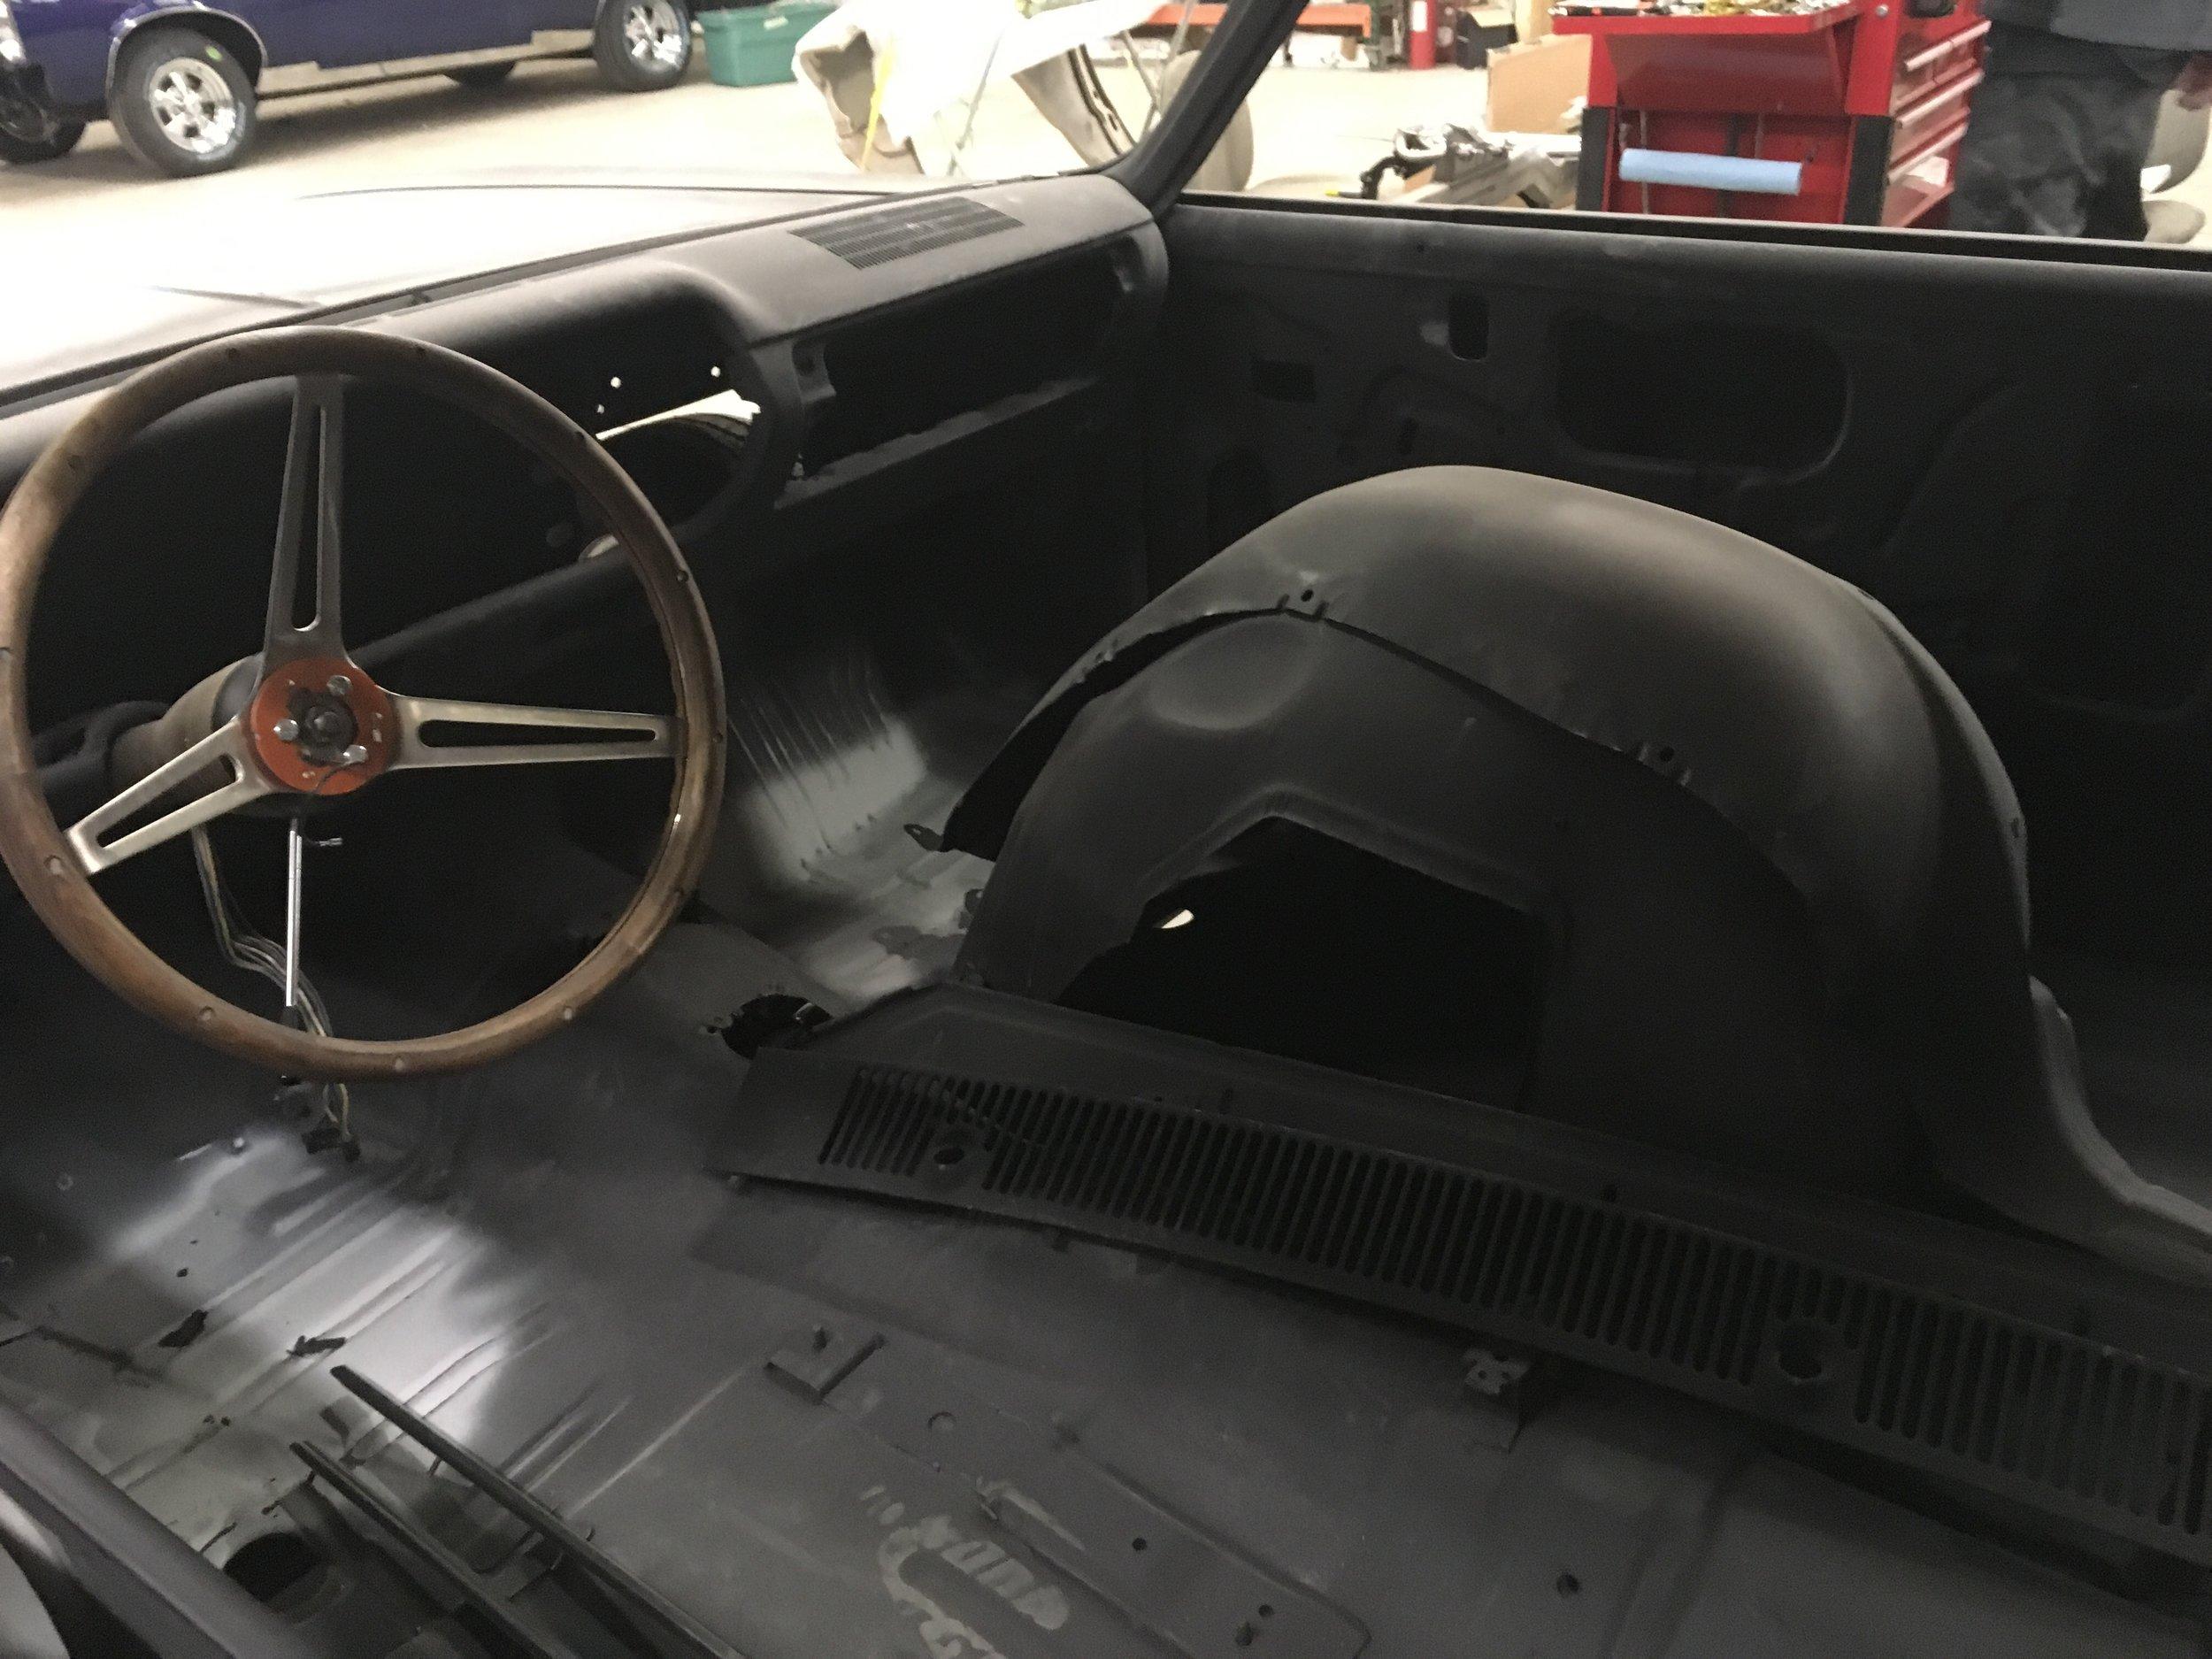 65-chevelle-interior-minneapolis-custom-hot-rod-car-restoration-hot-rod-factory.jpg